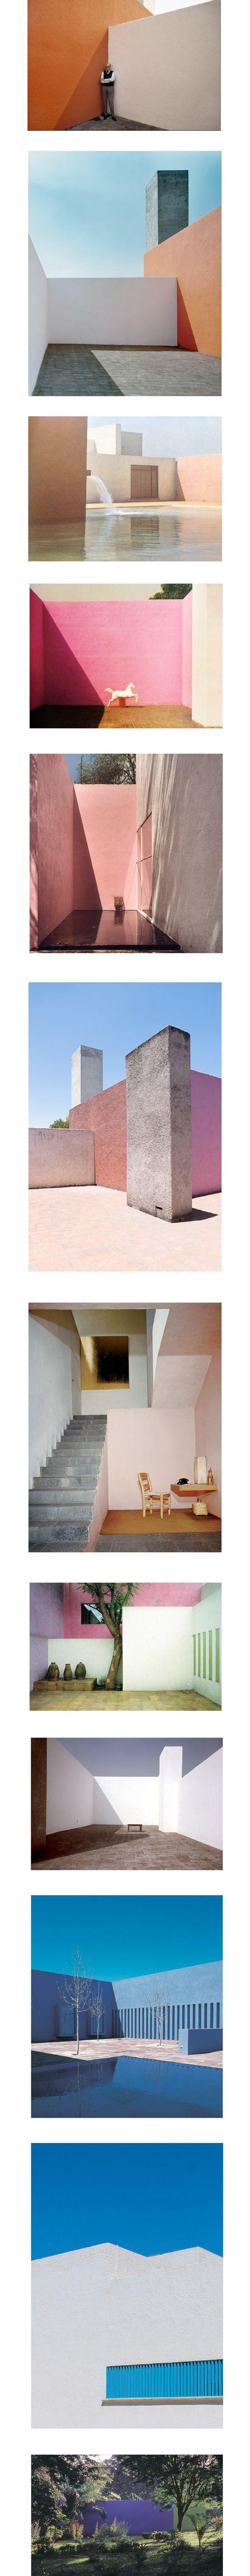 Luis Barragan, architecte mexicain (1902-1988) like Alice in Wonderland !